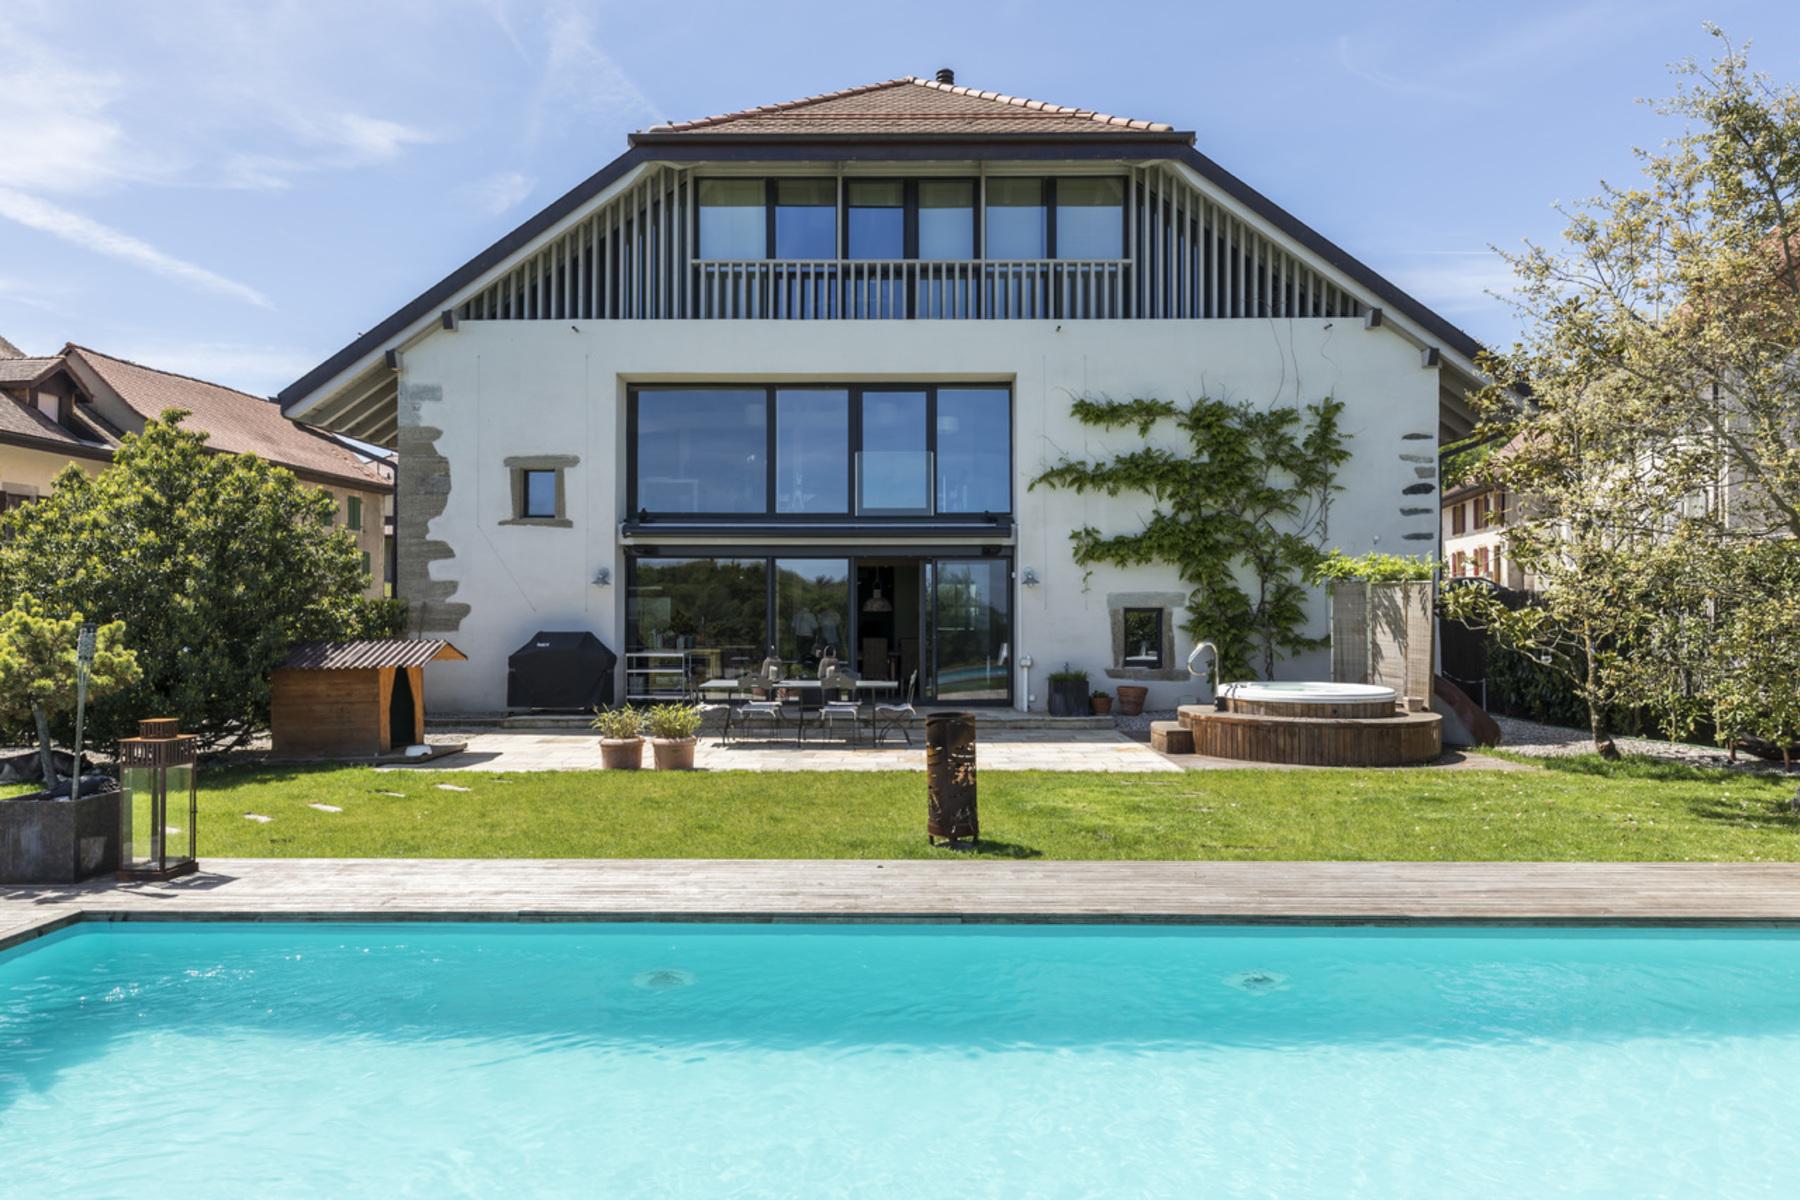 Частный односемейный дом для того Продажа на Modern property with exceptional character Campagne Yverdonnoise Villars-Epeney, Во, 1404 Швейцария